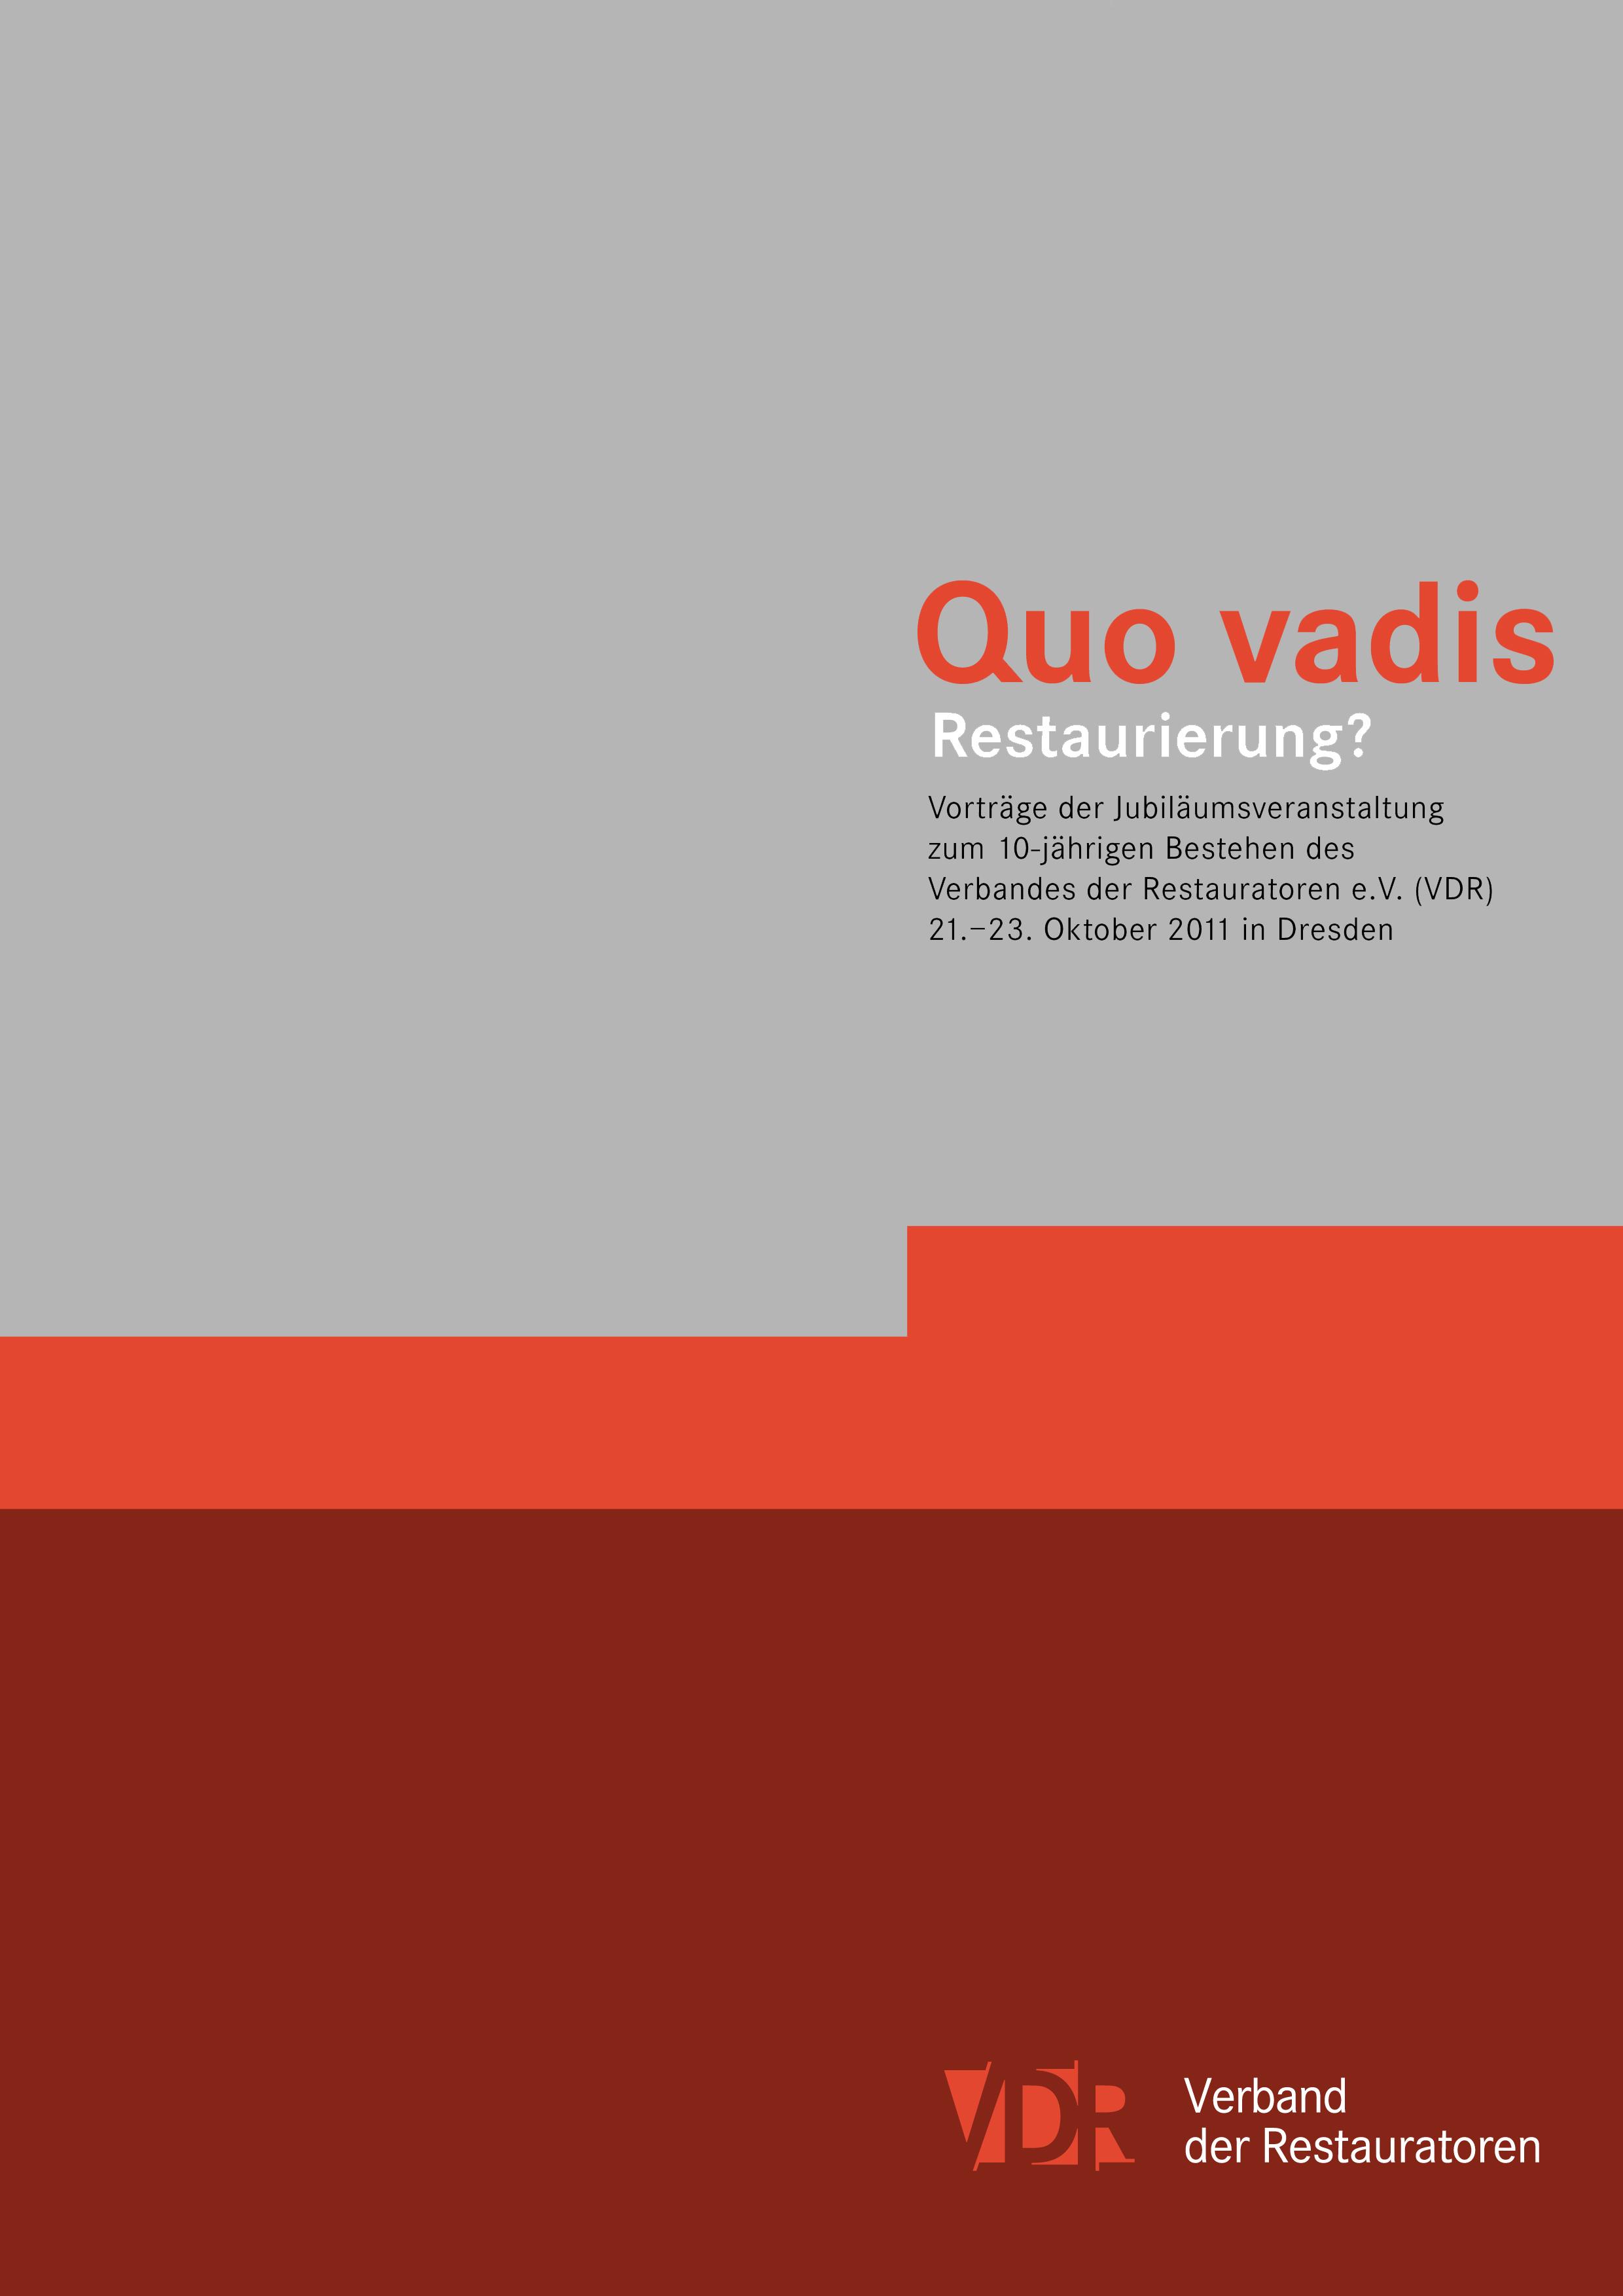 Microsoft Word - Quo Vadis Restaurierung_JanaMac3F.doc